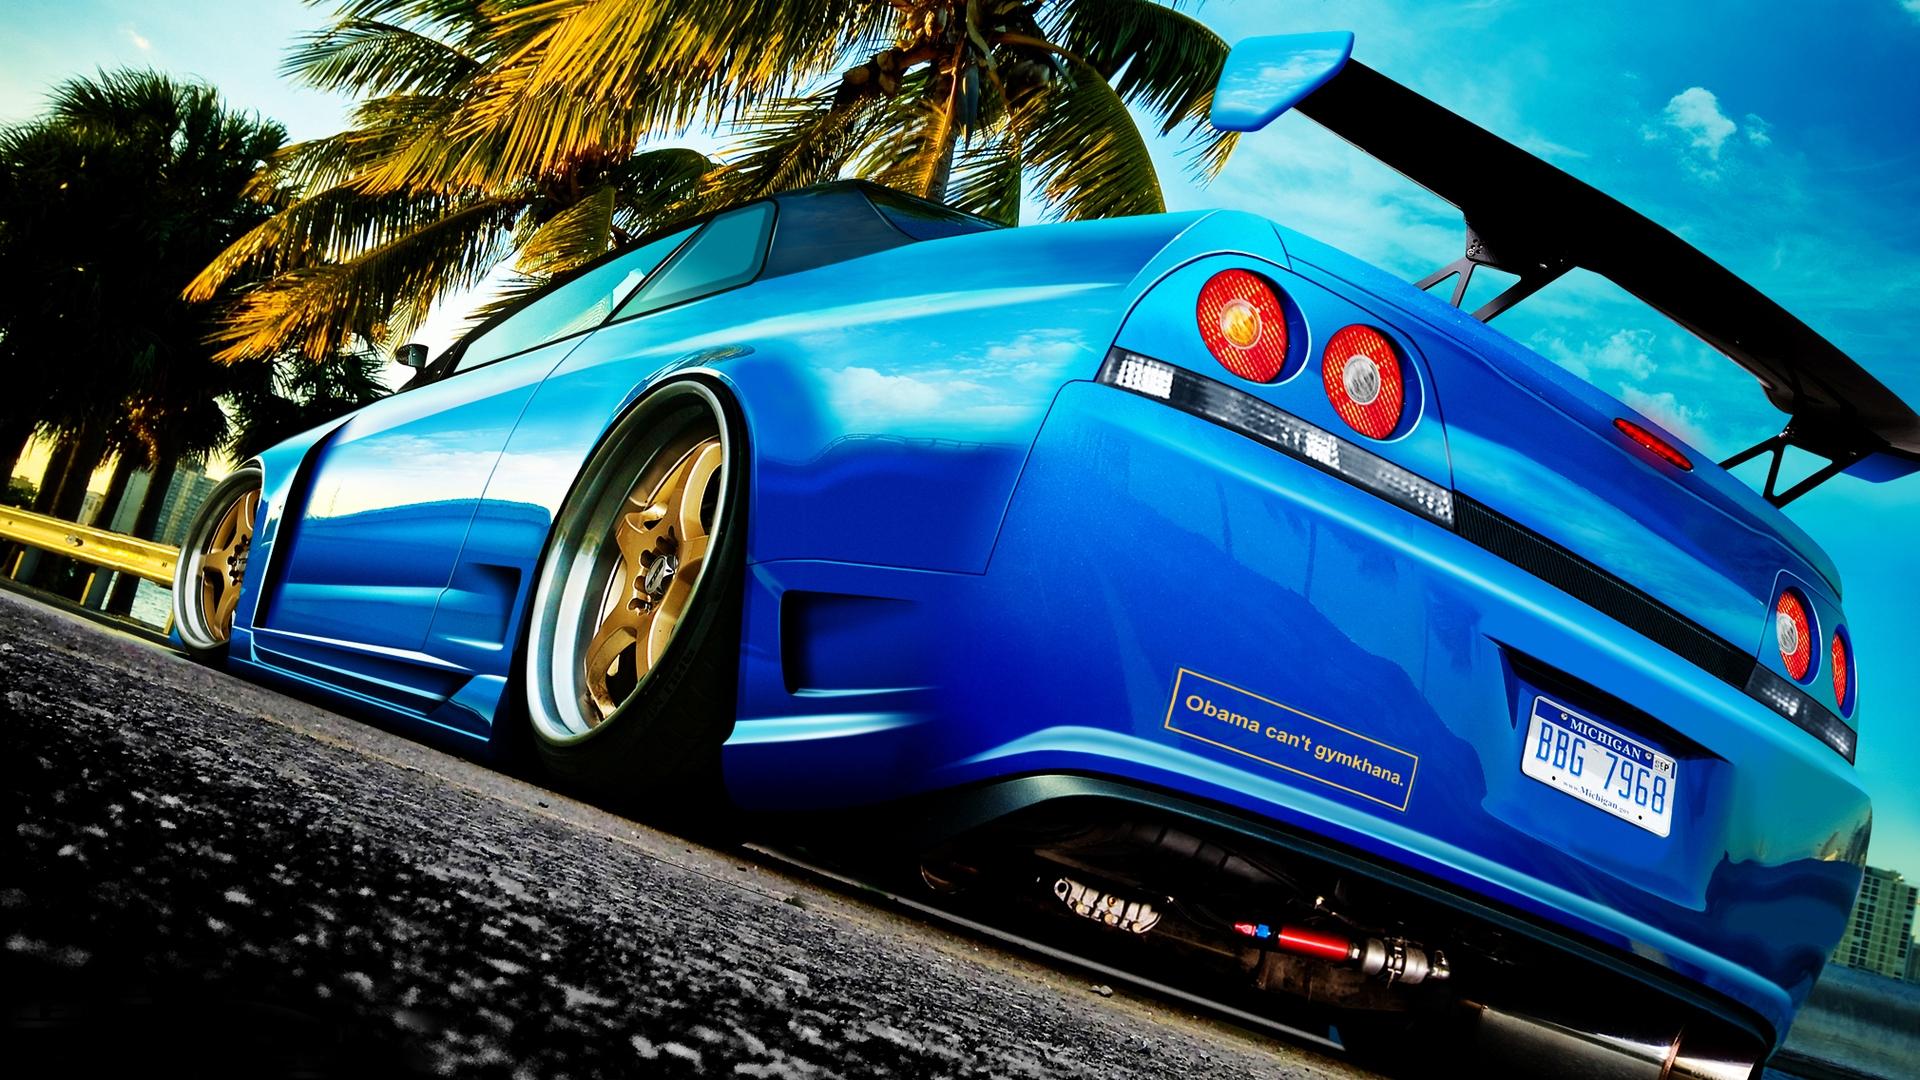 Free download Wallpaper Nissan Skyline Drifting Wallpaper ...